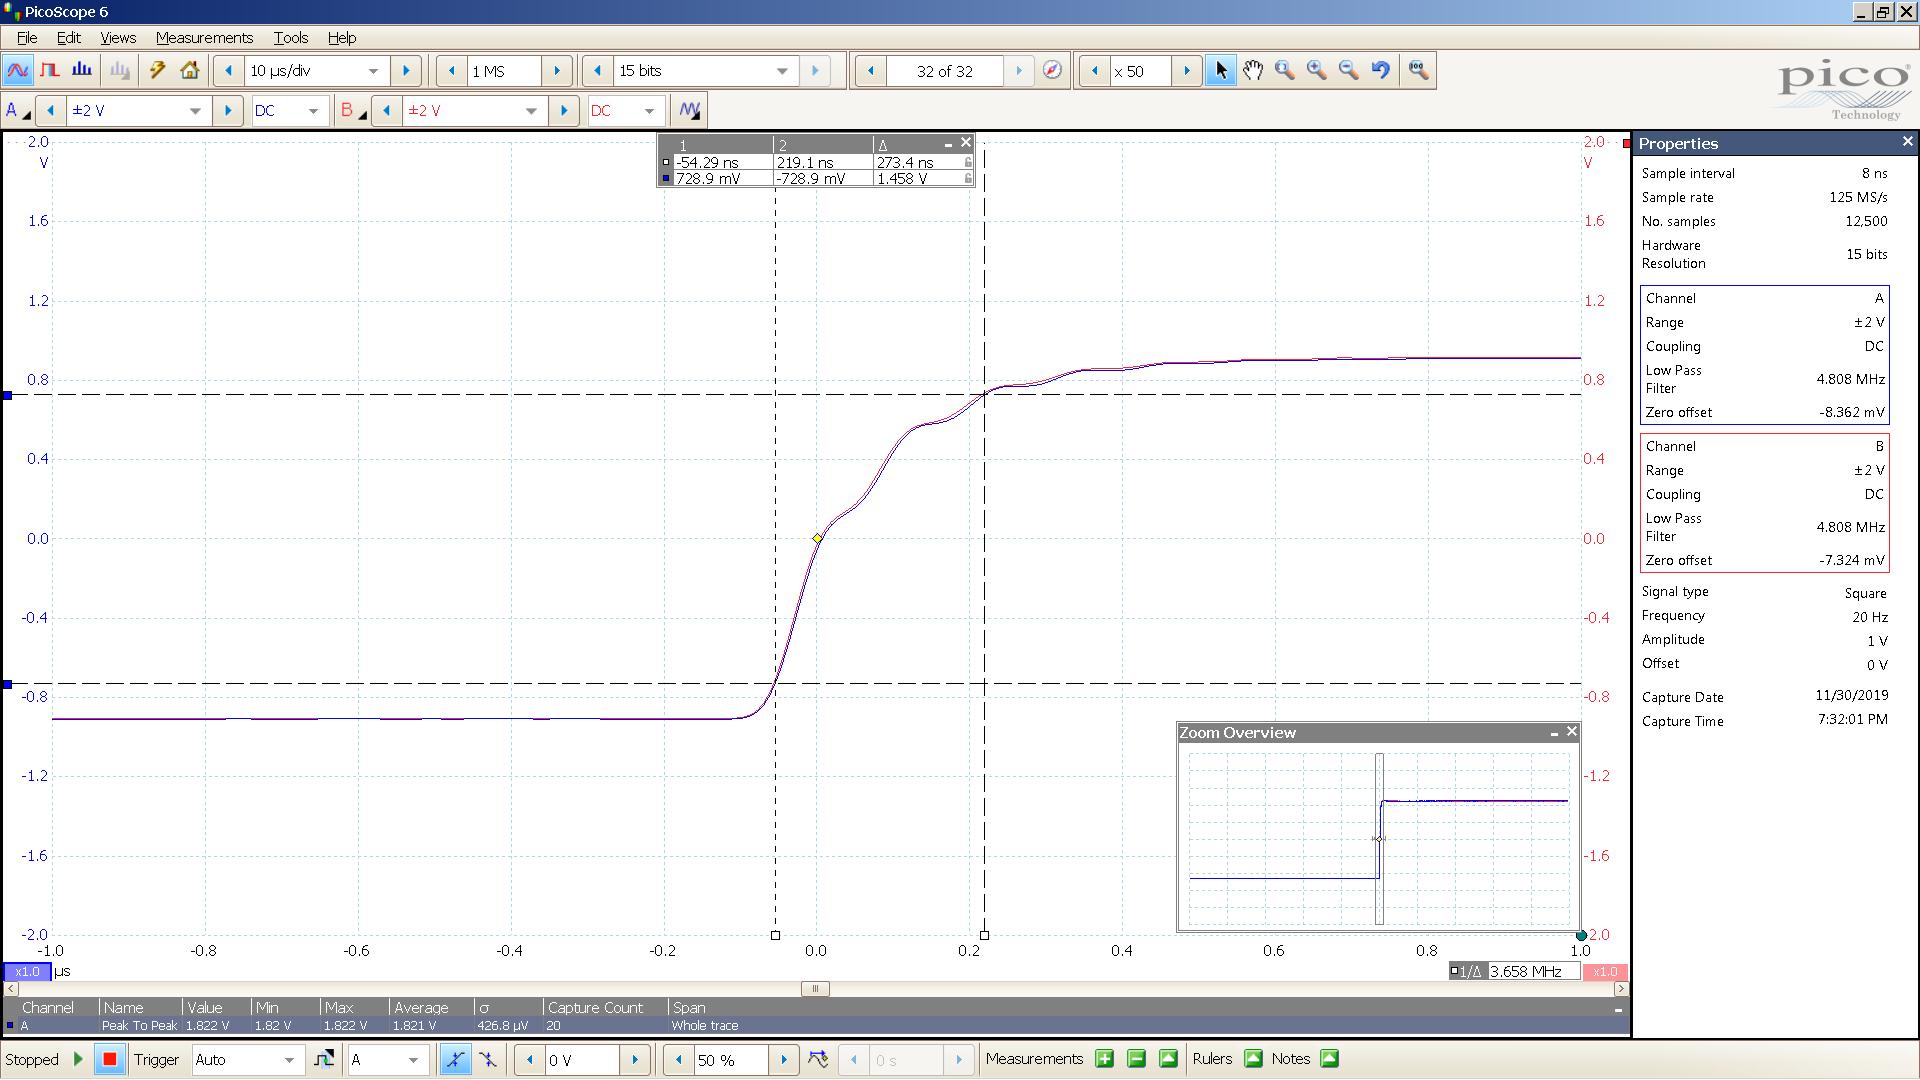 20190930 SigGen magni 3+ 20 Hz square 2000mVpp 200nS div 5MHz filter 300R - BW calc.png